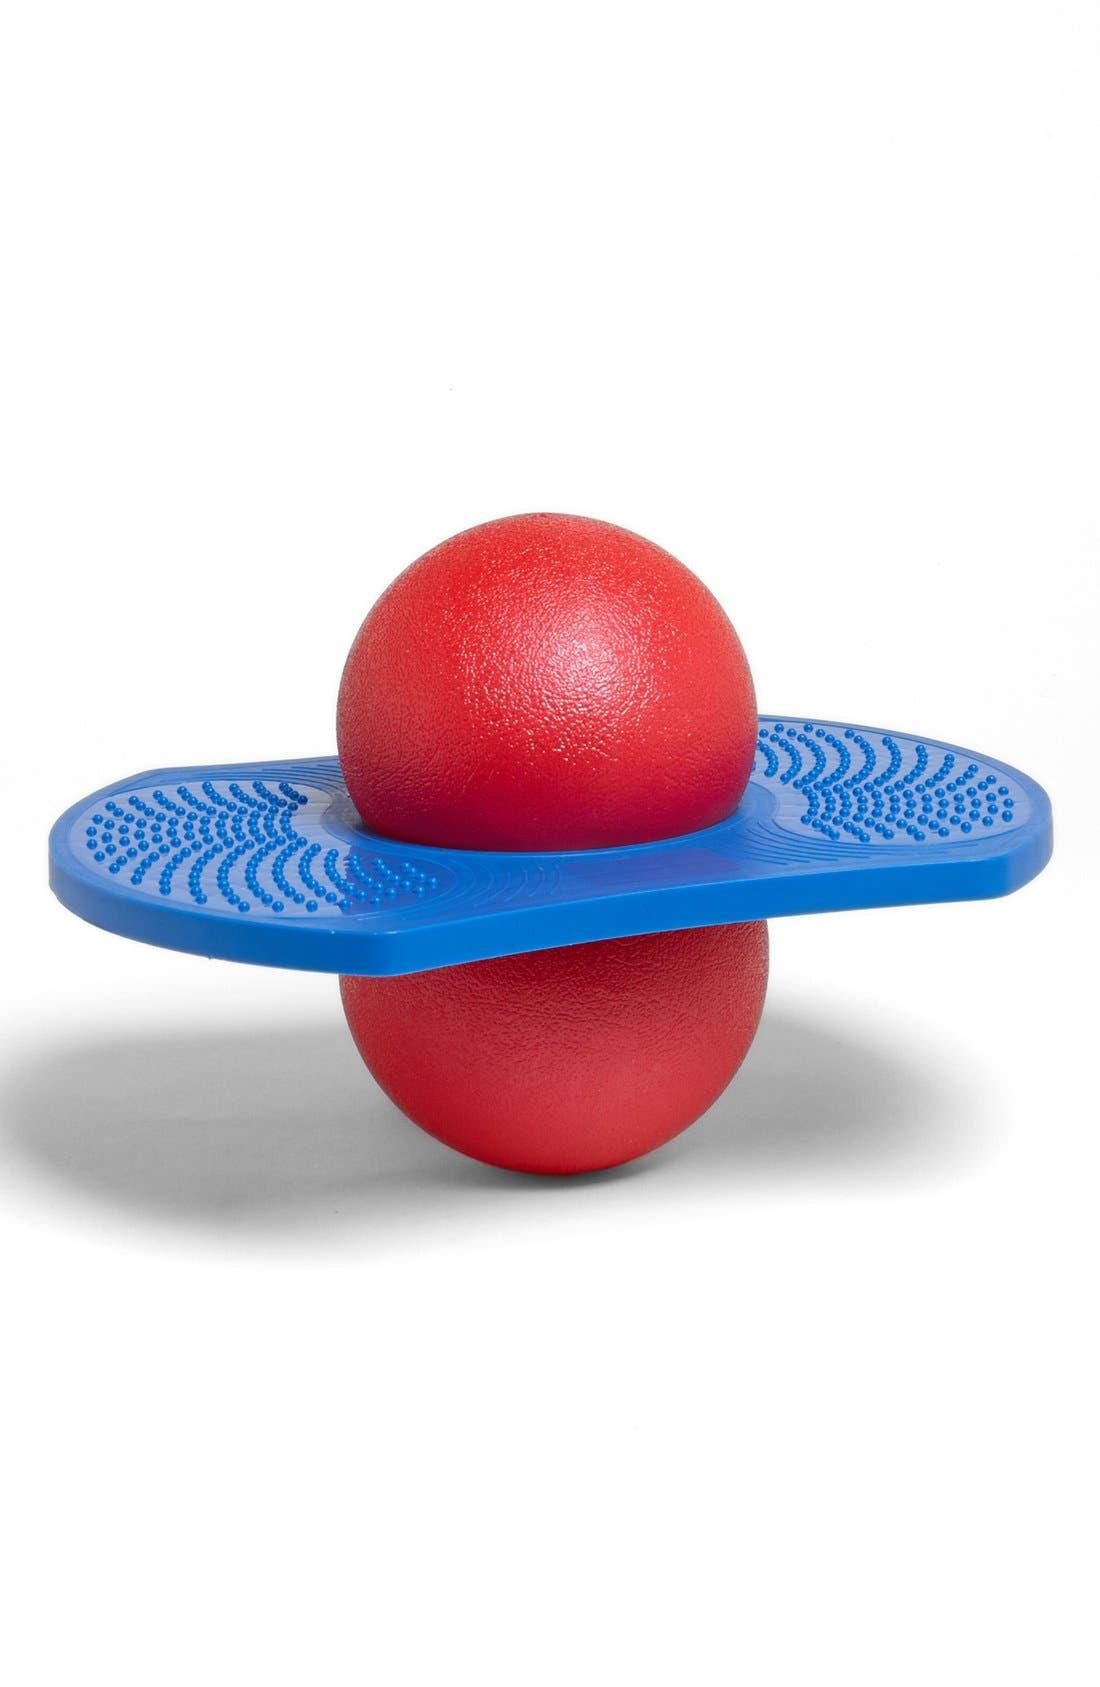 Main Image - Geospace International Toys 'Air Pogo' Jumper